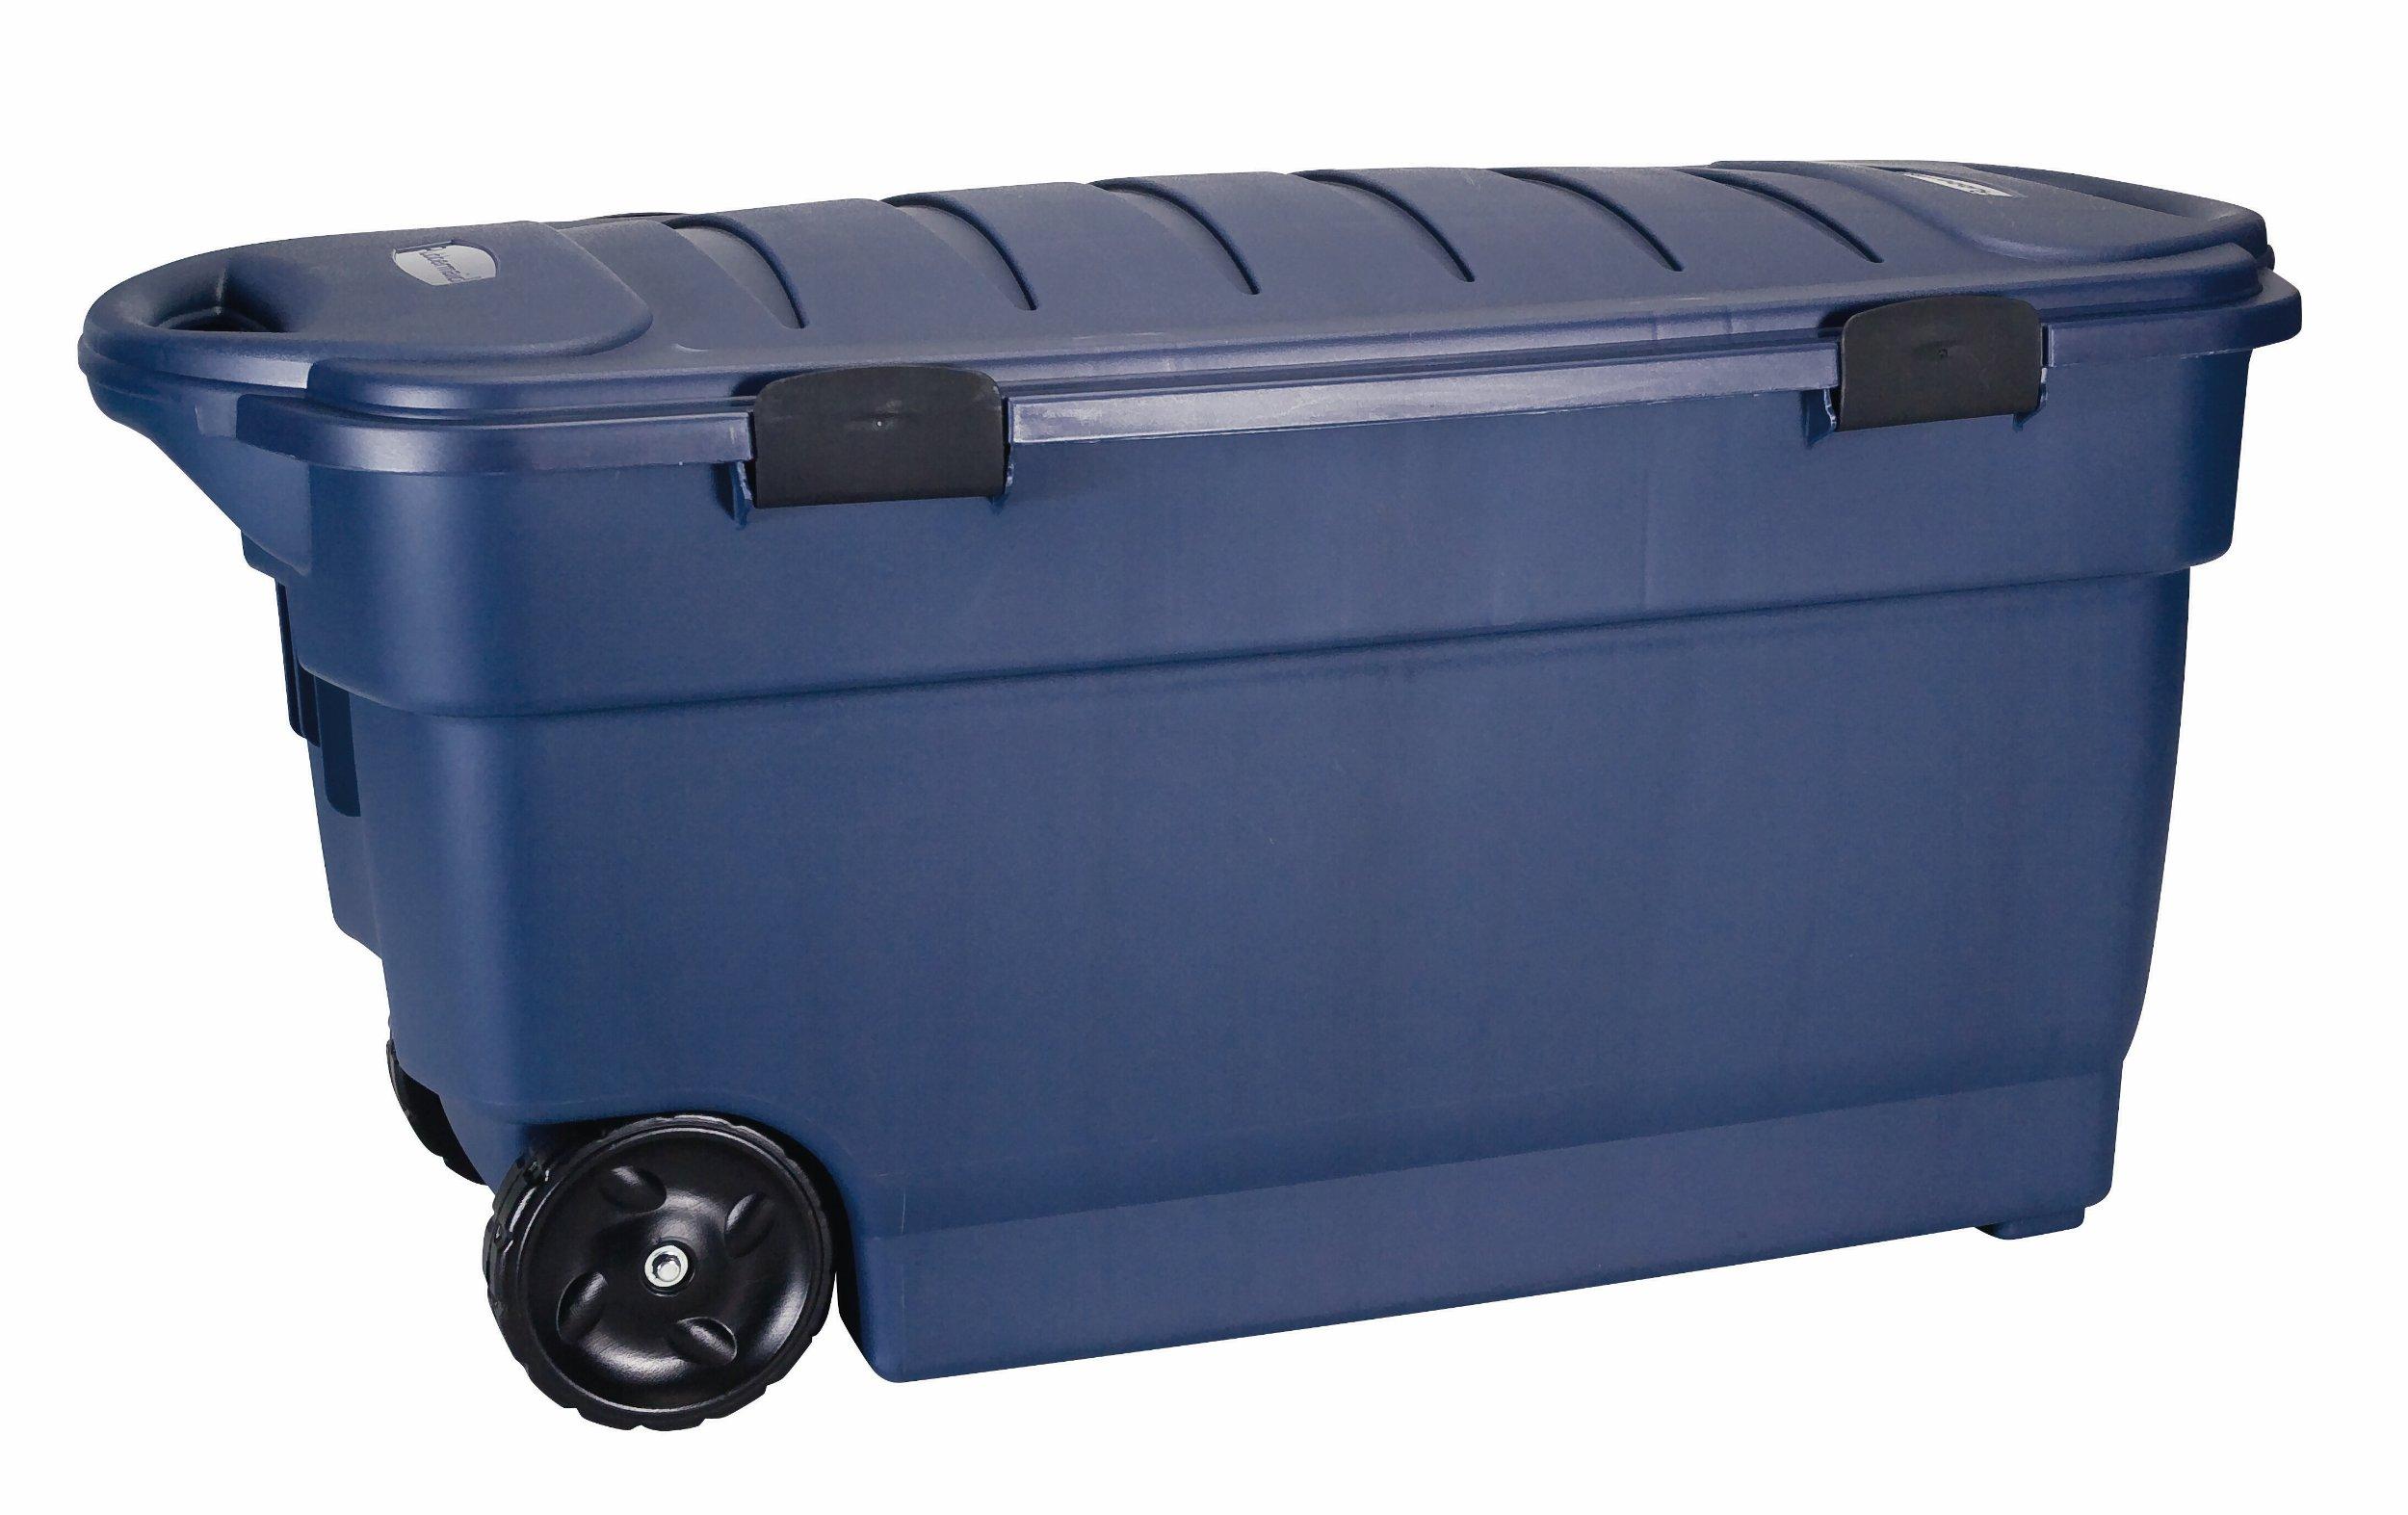 Rubbermaid Roughneck ToteLocker Wheeled Storage Container, Dark Indigo Metallic, 45-gallon (FG246300DIM)